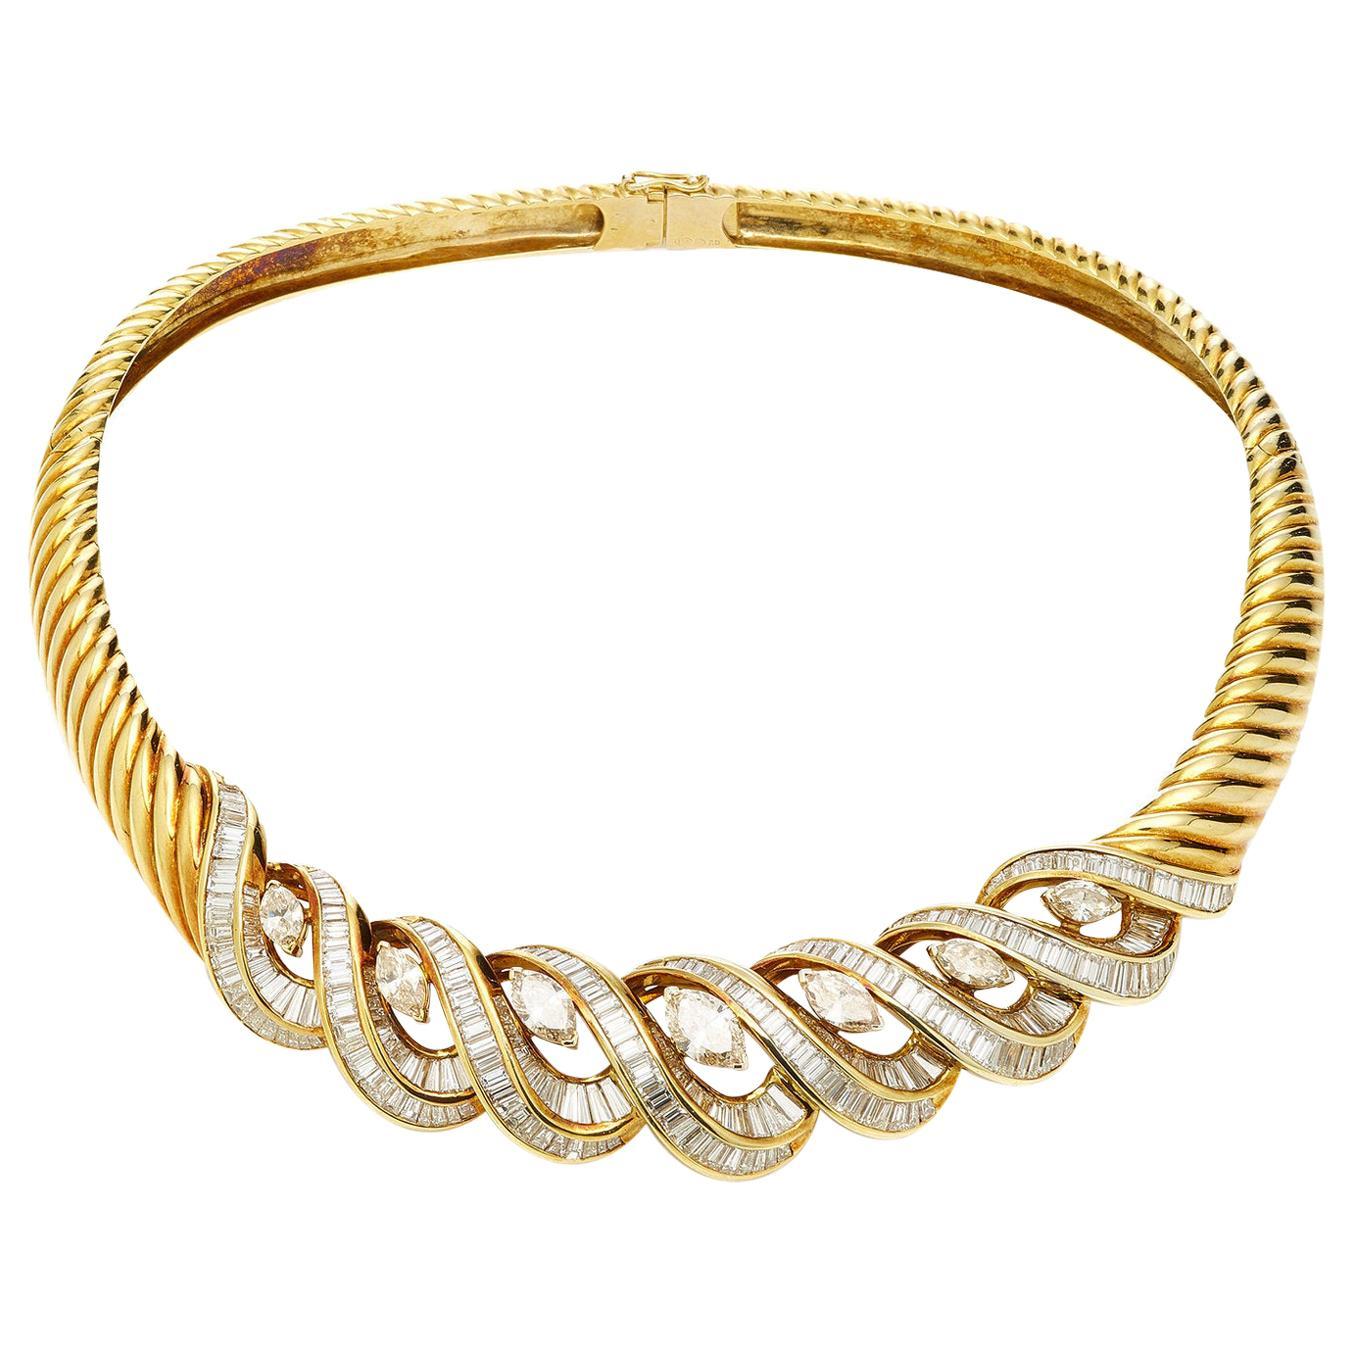 Italian Gold and Diamond Necklace